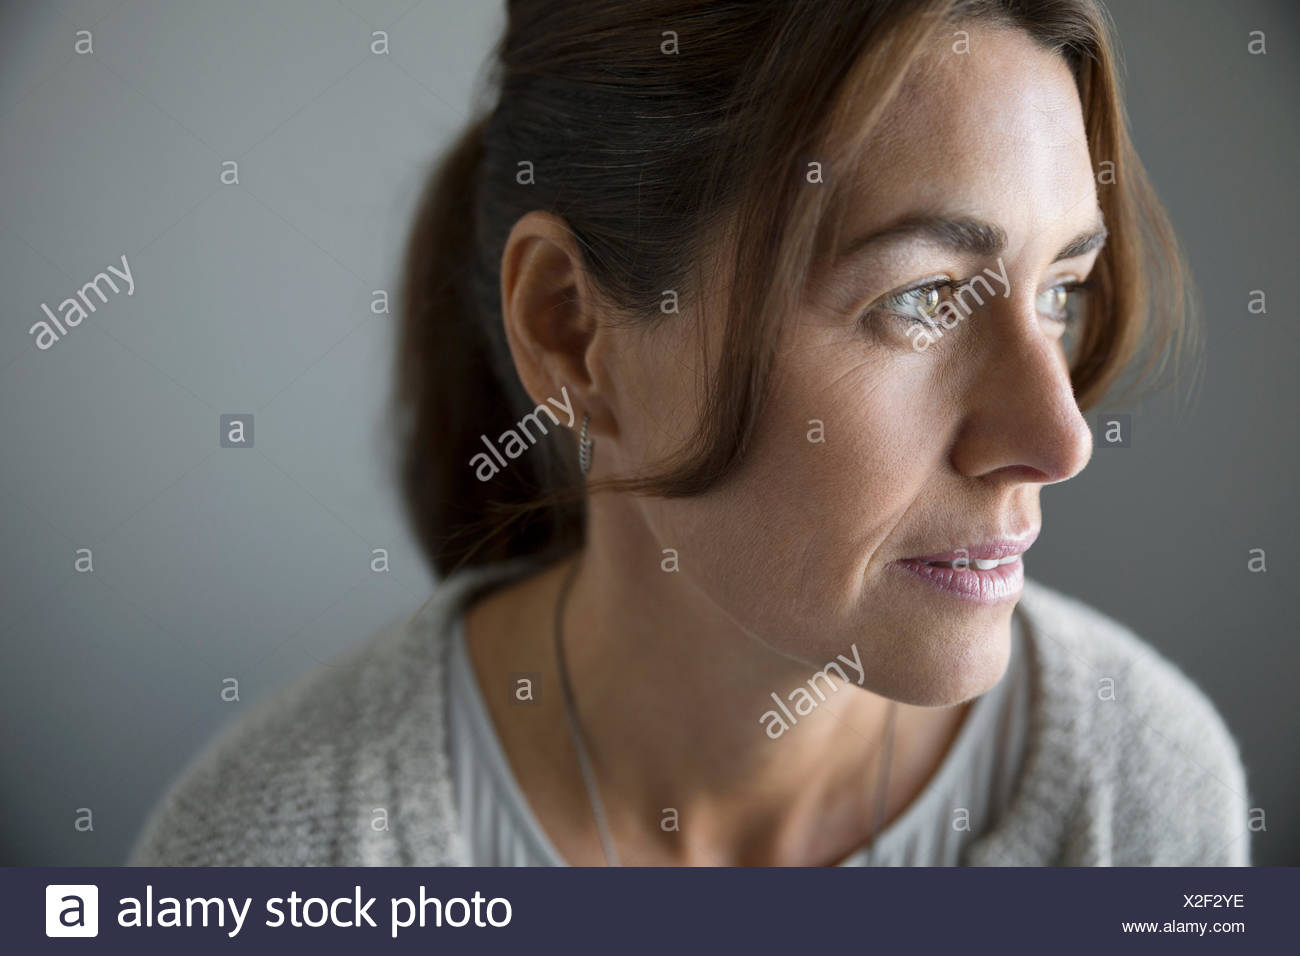 Nachdenklich Brünette Frau wegsehen hautnah Stockbild